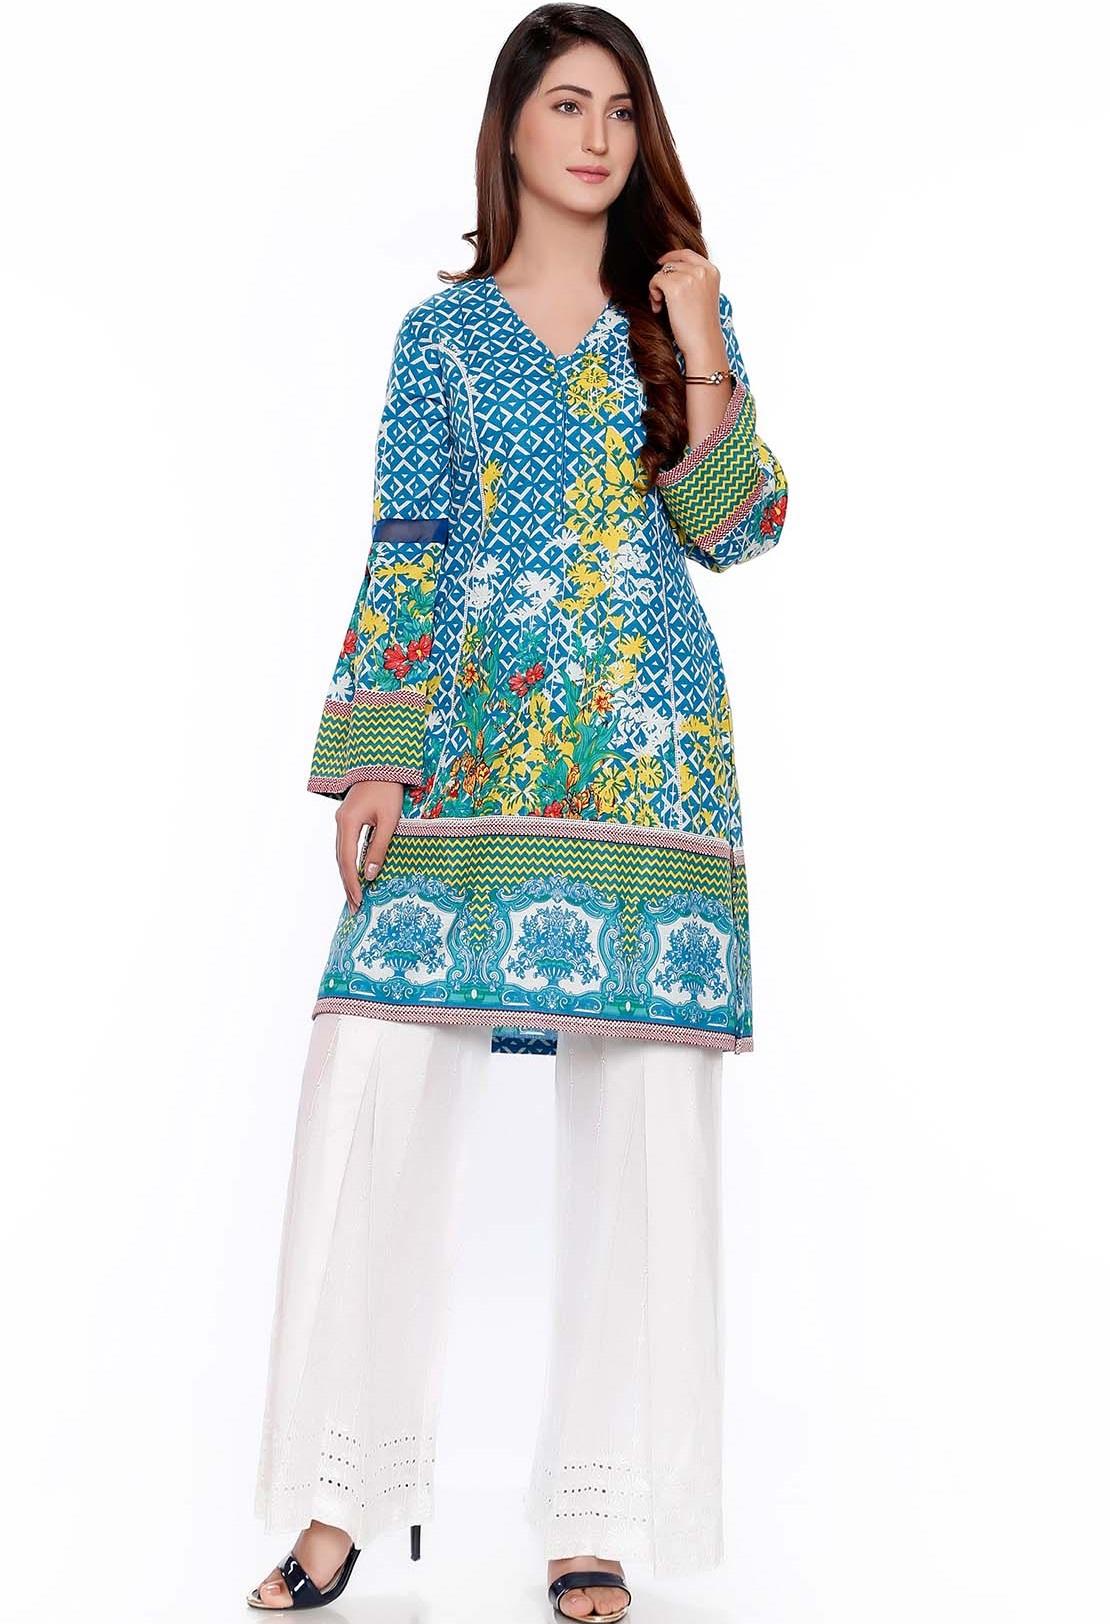 Warda designer winter Khaddar shirt